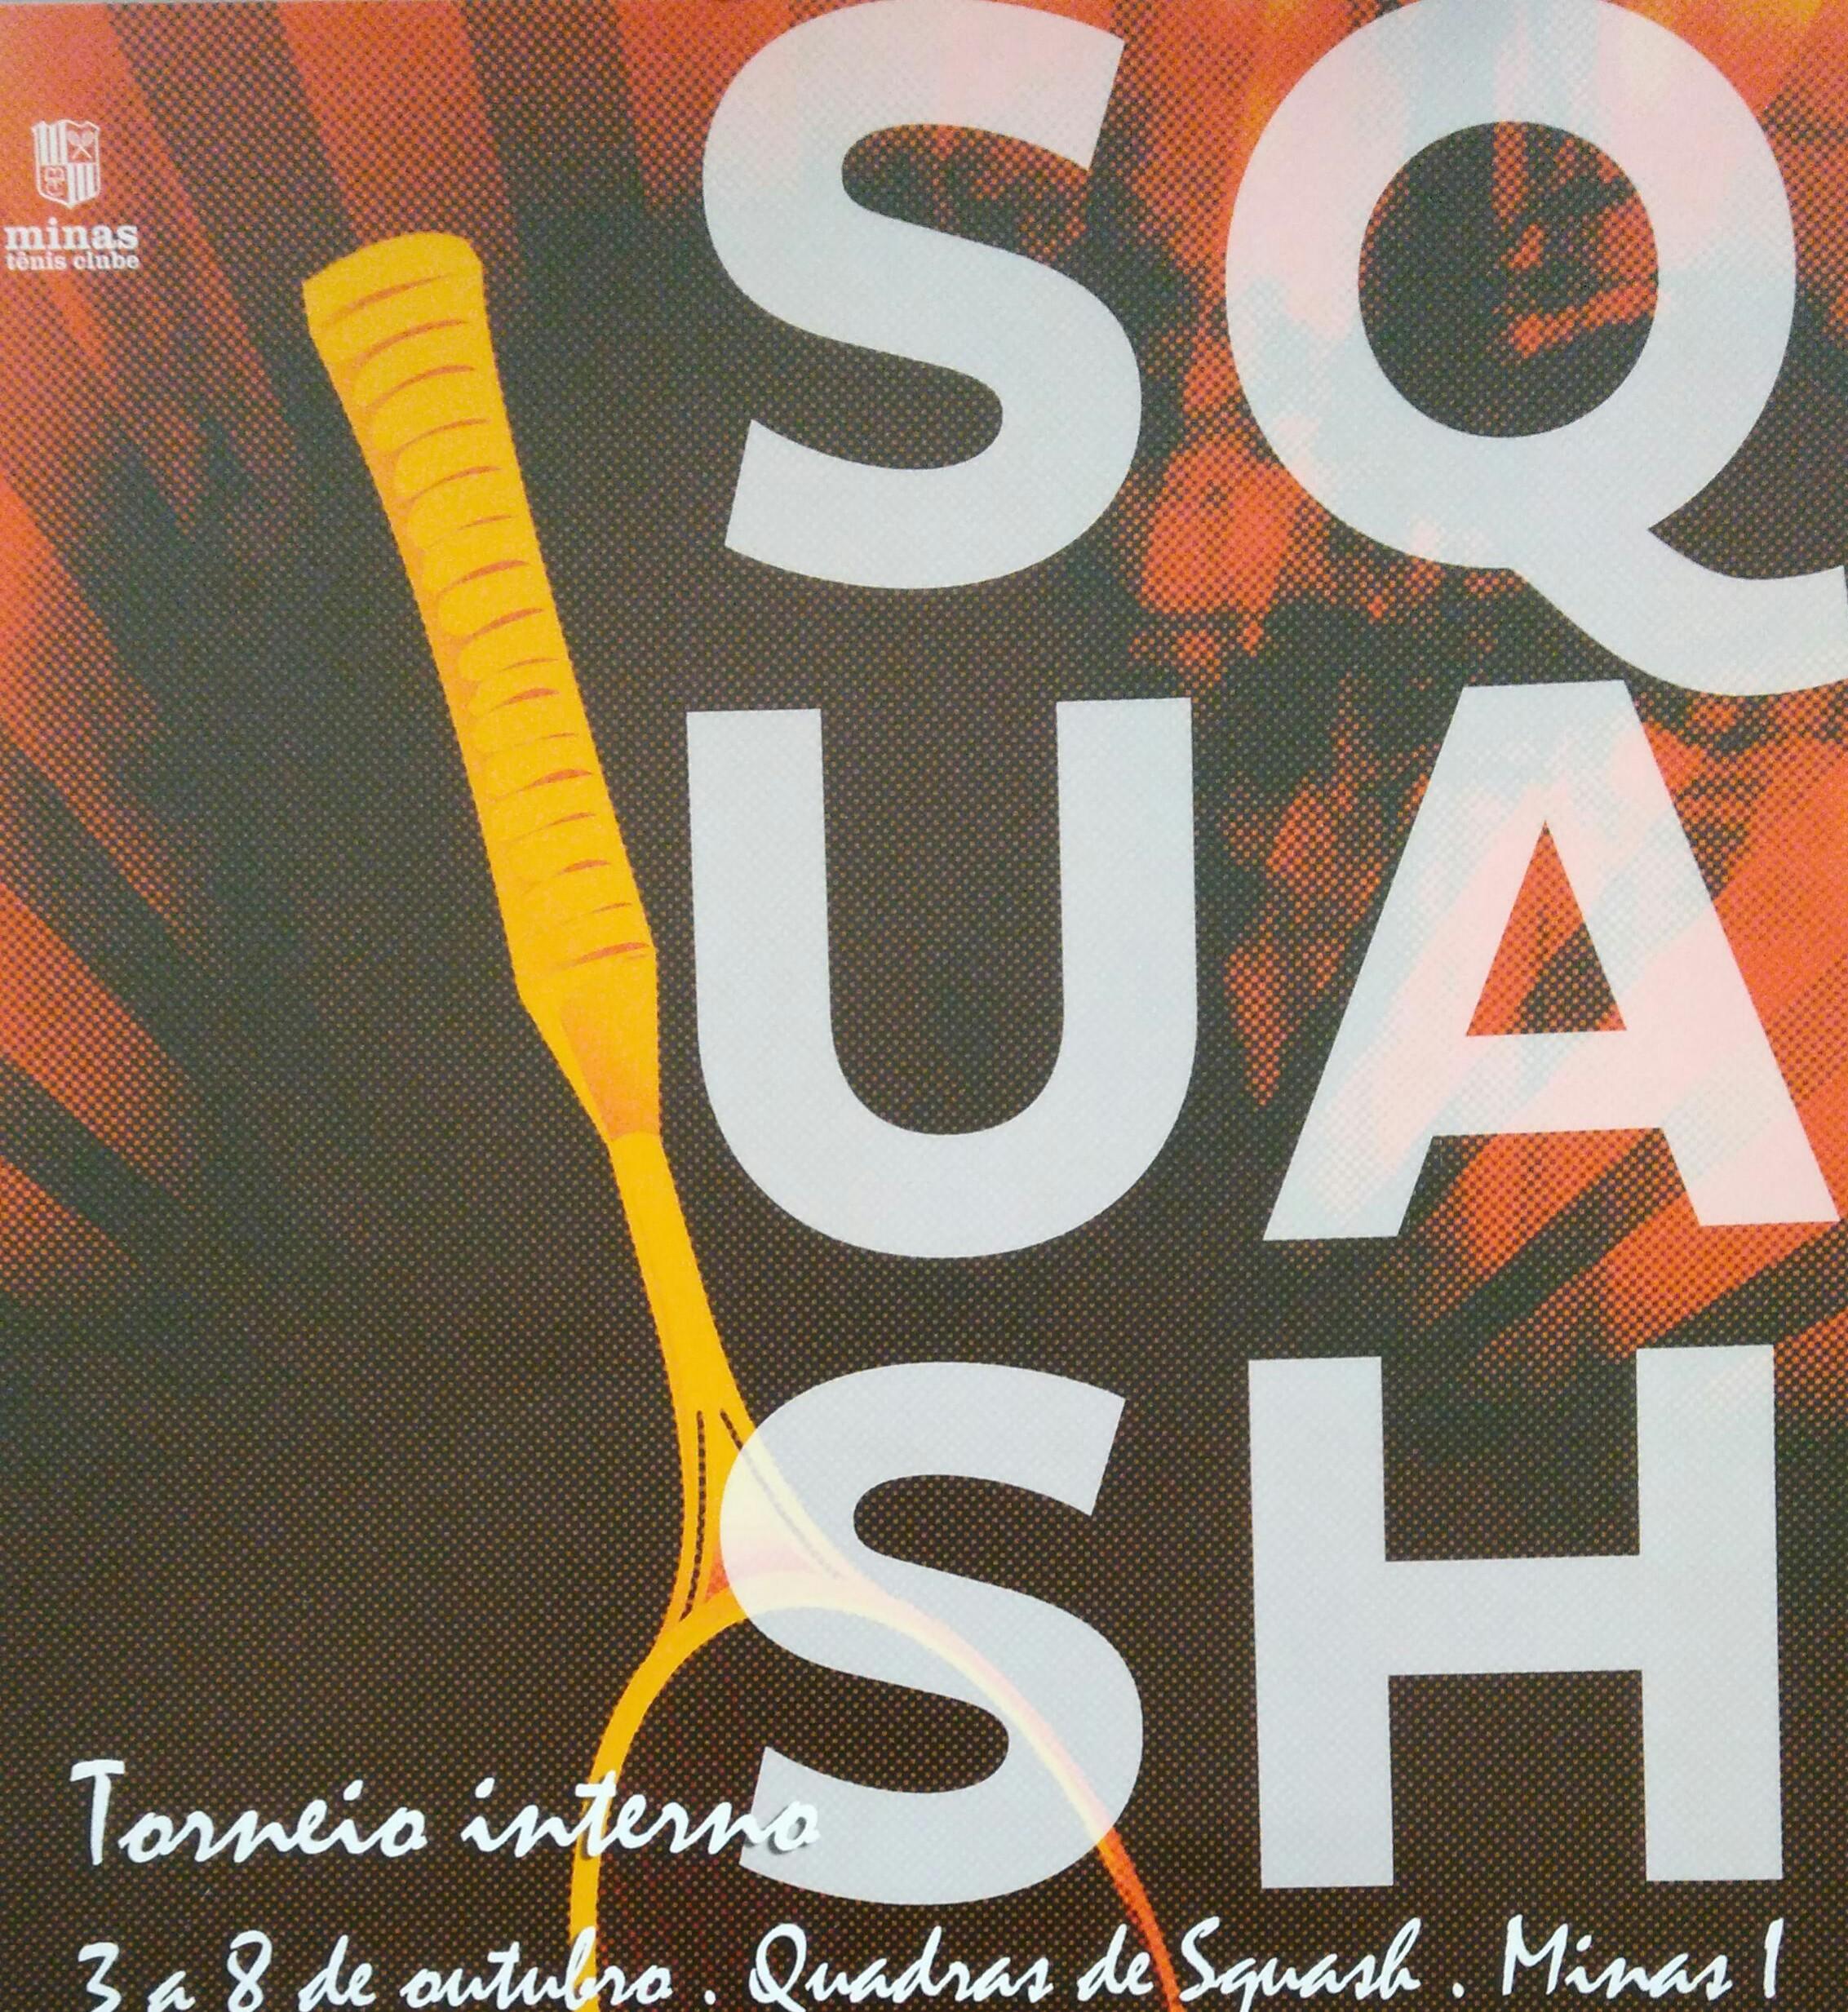 II Torneio interno de Squash Minas Tênis Clube 2016